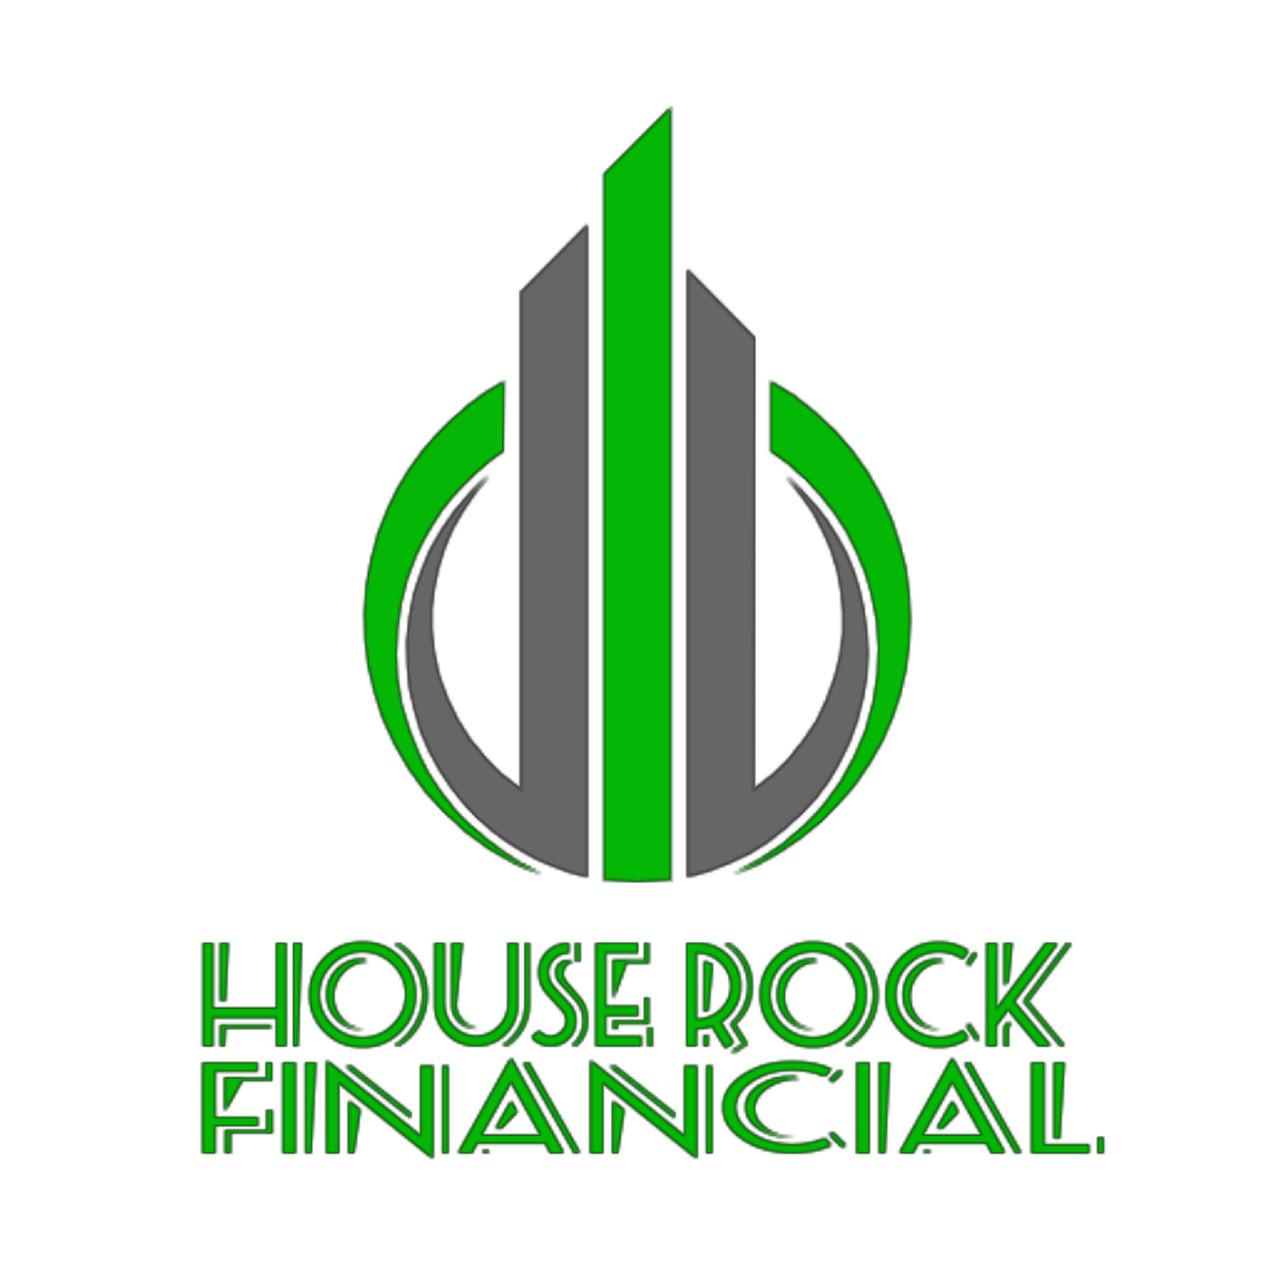 House Rock Financial logo